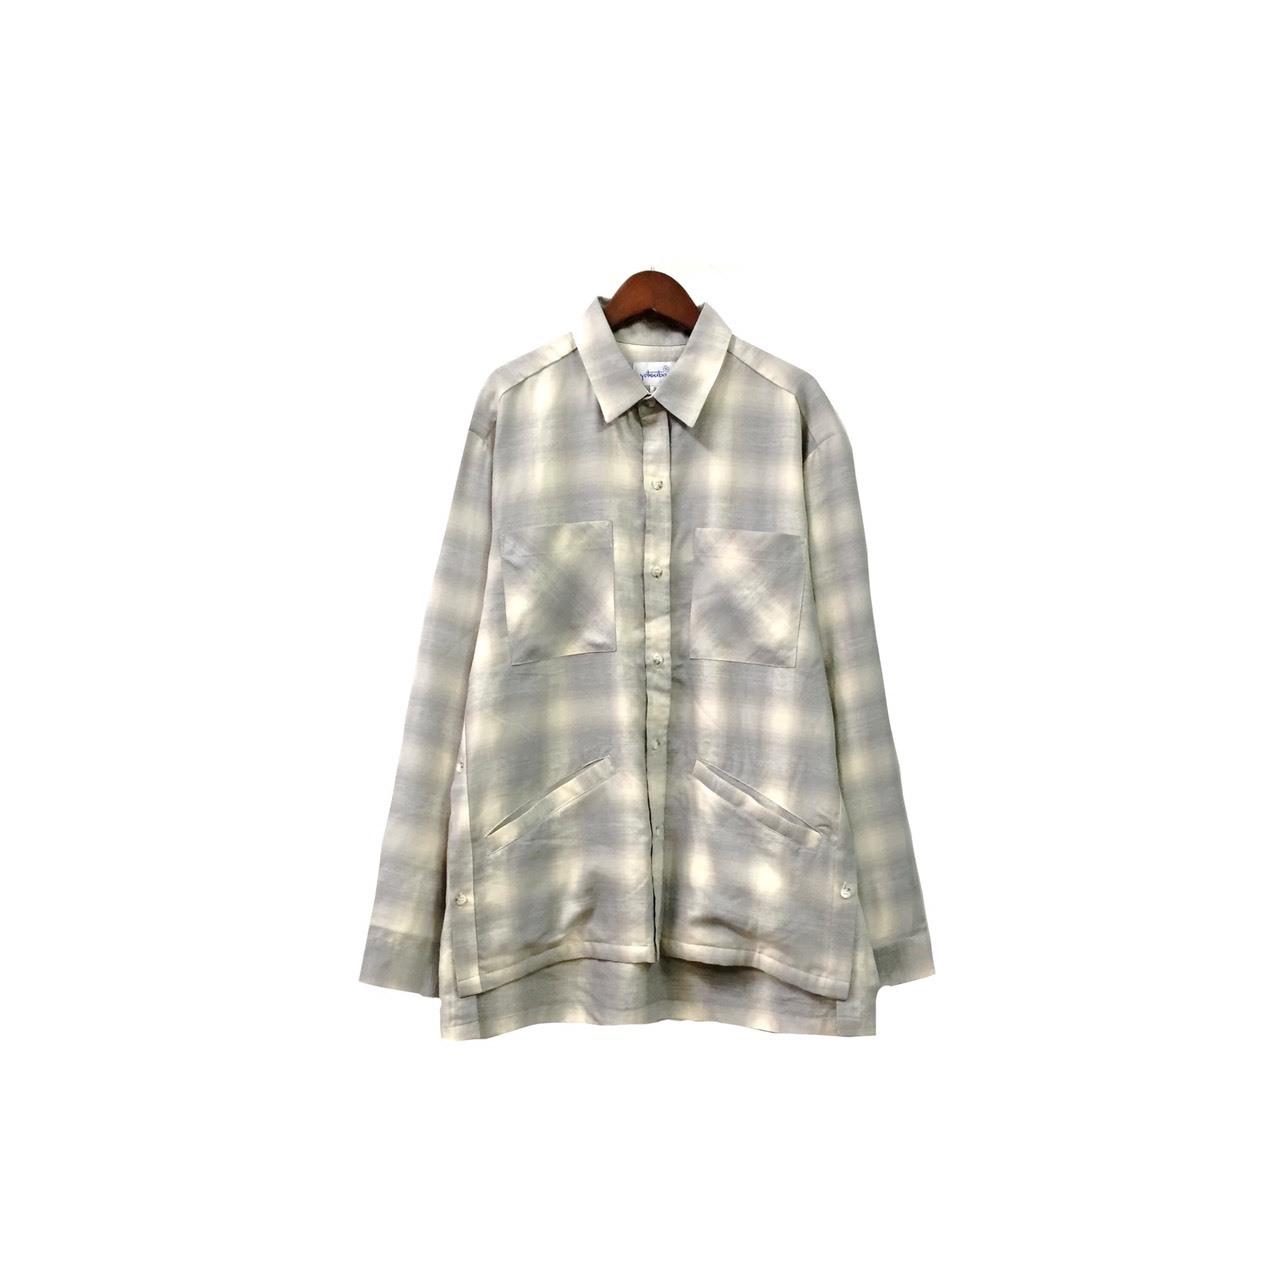 yotsuba - Cotton & Rayon Check Shirt / Gray ¥22000+tax